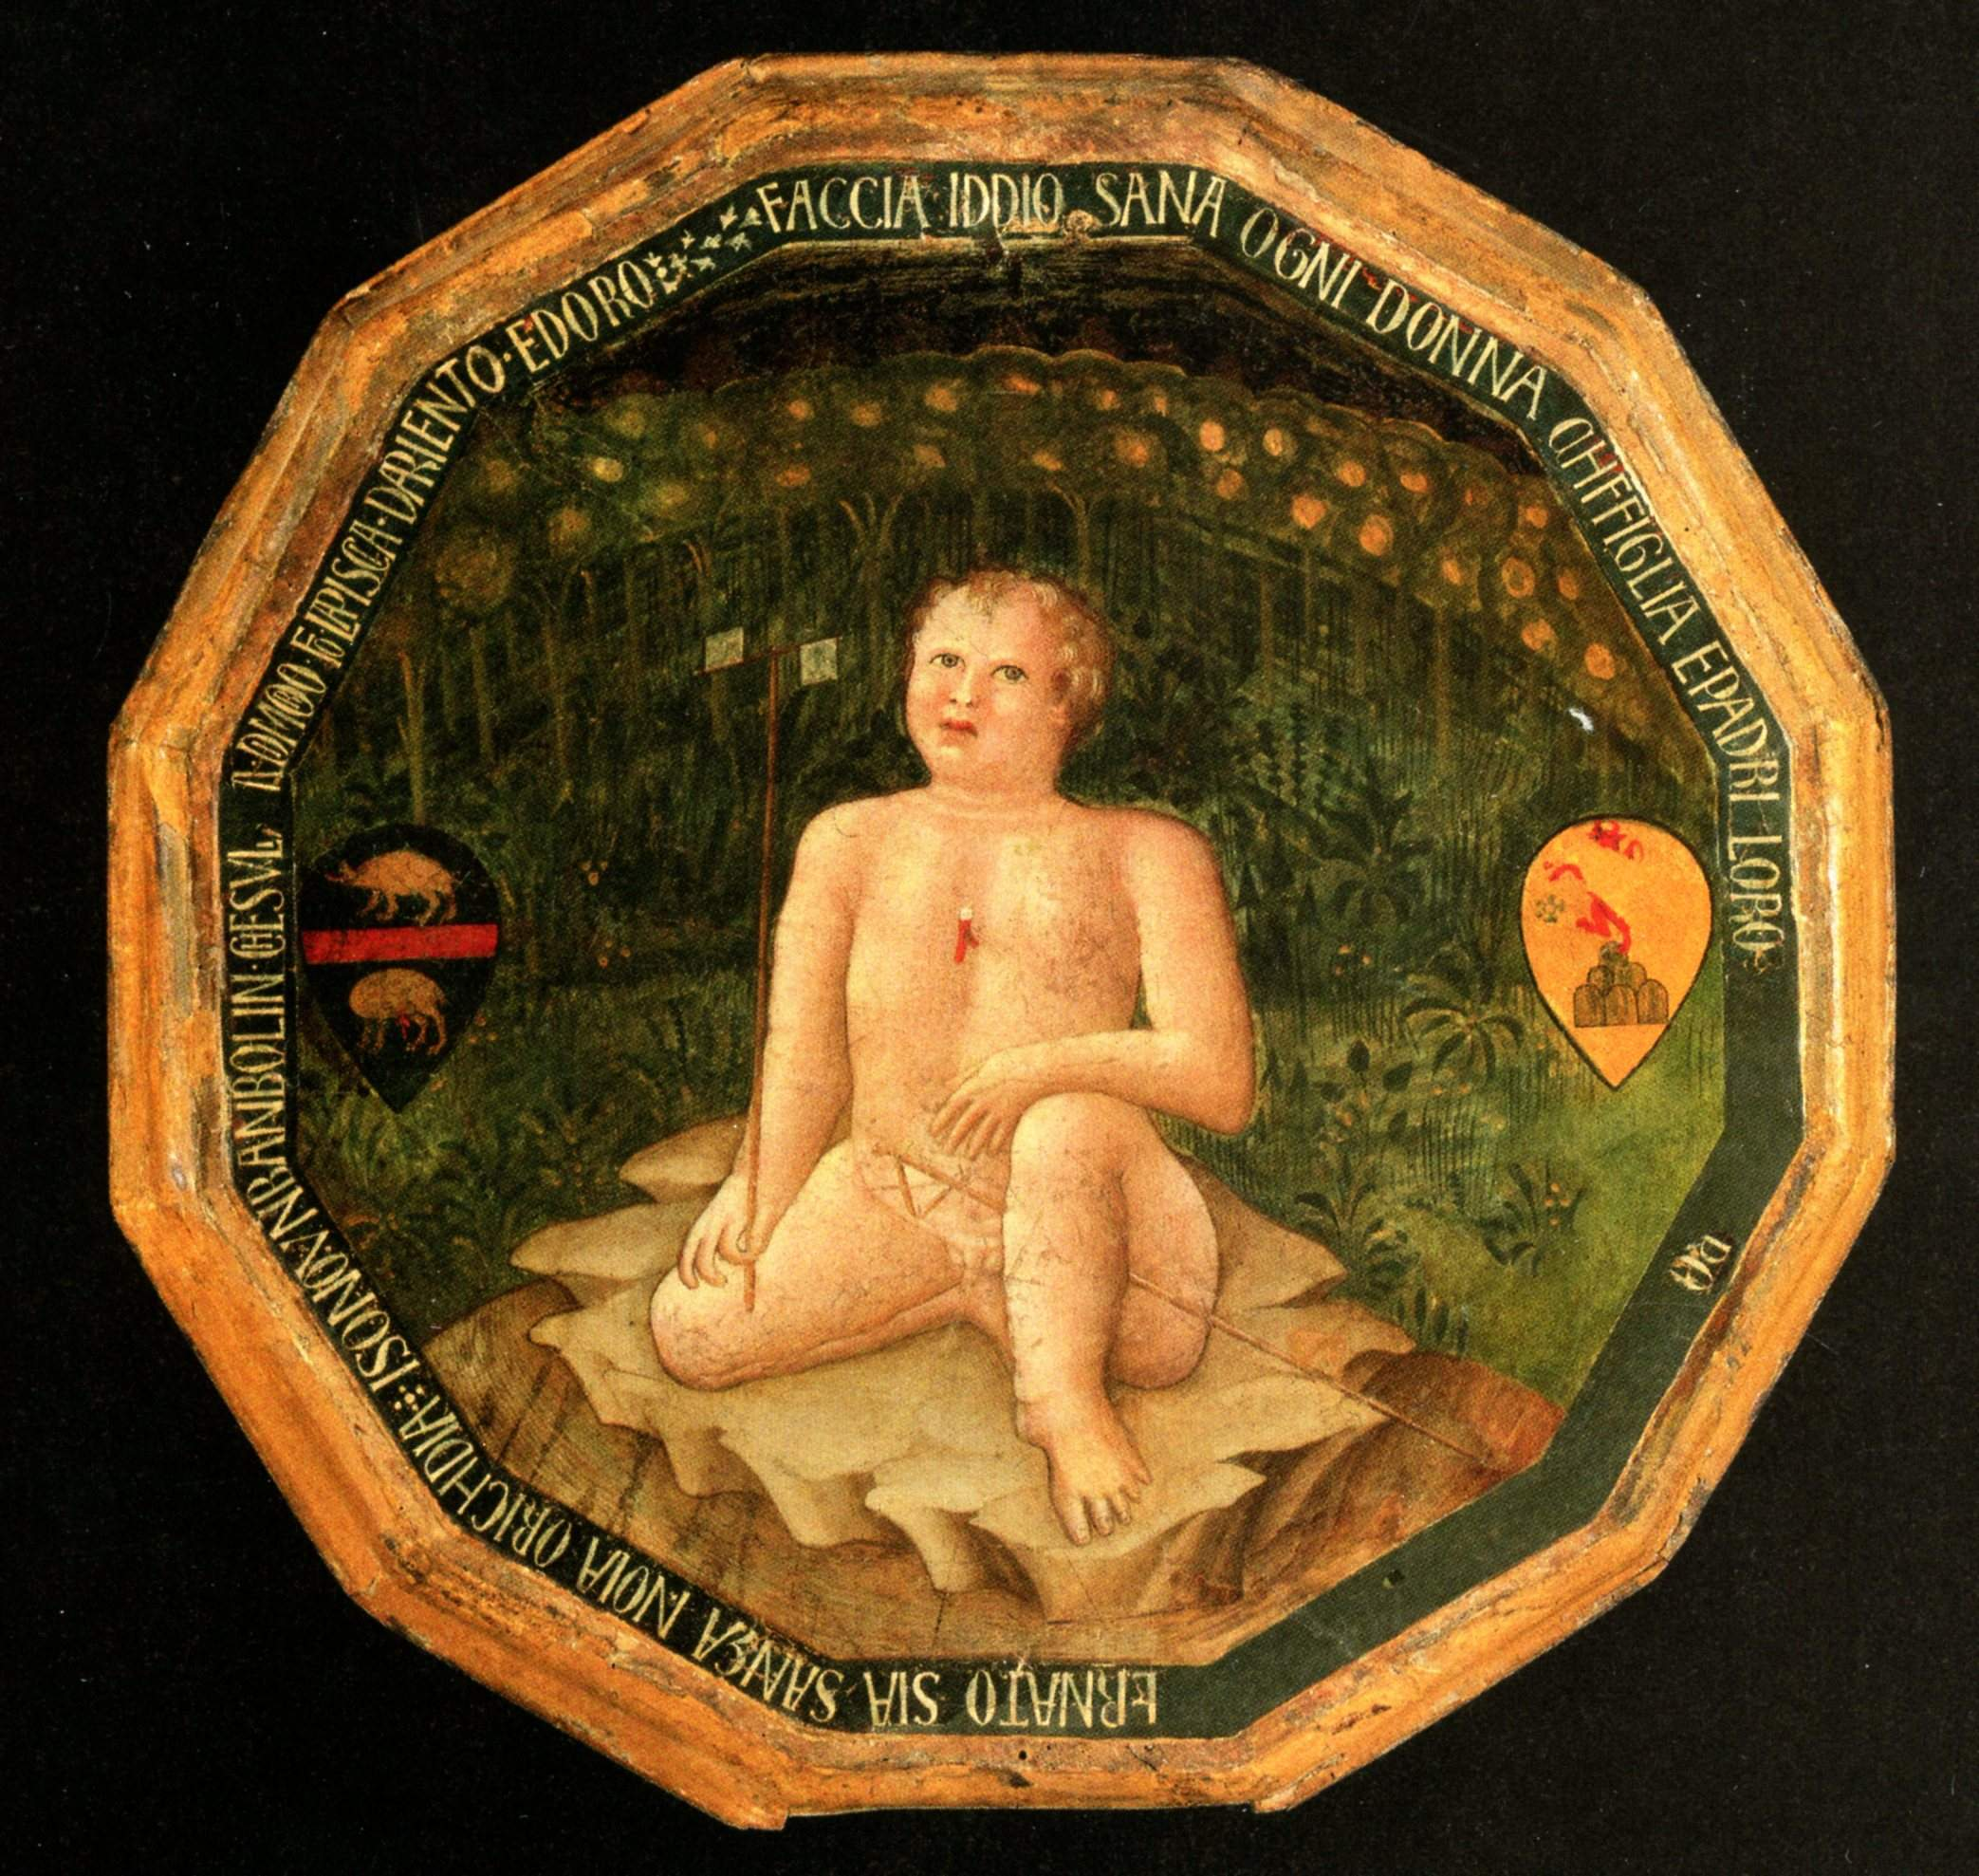 Bartolomeo Fruosino, desco da parto, 1420, Coll Privée (1)